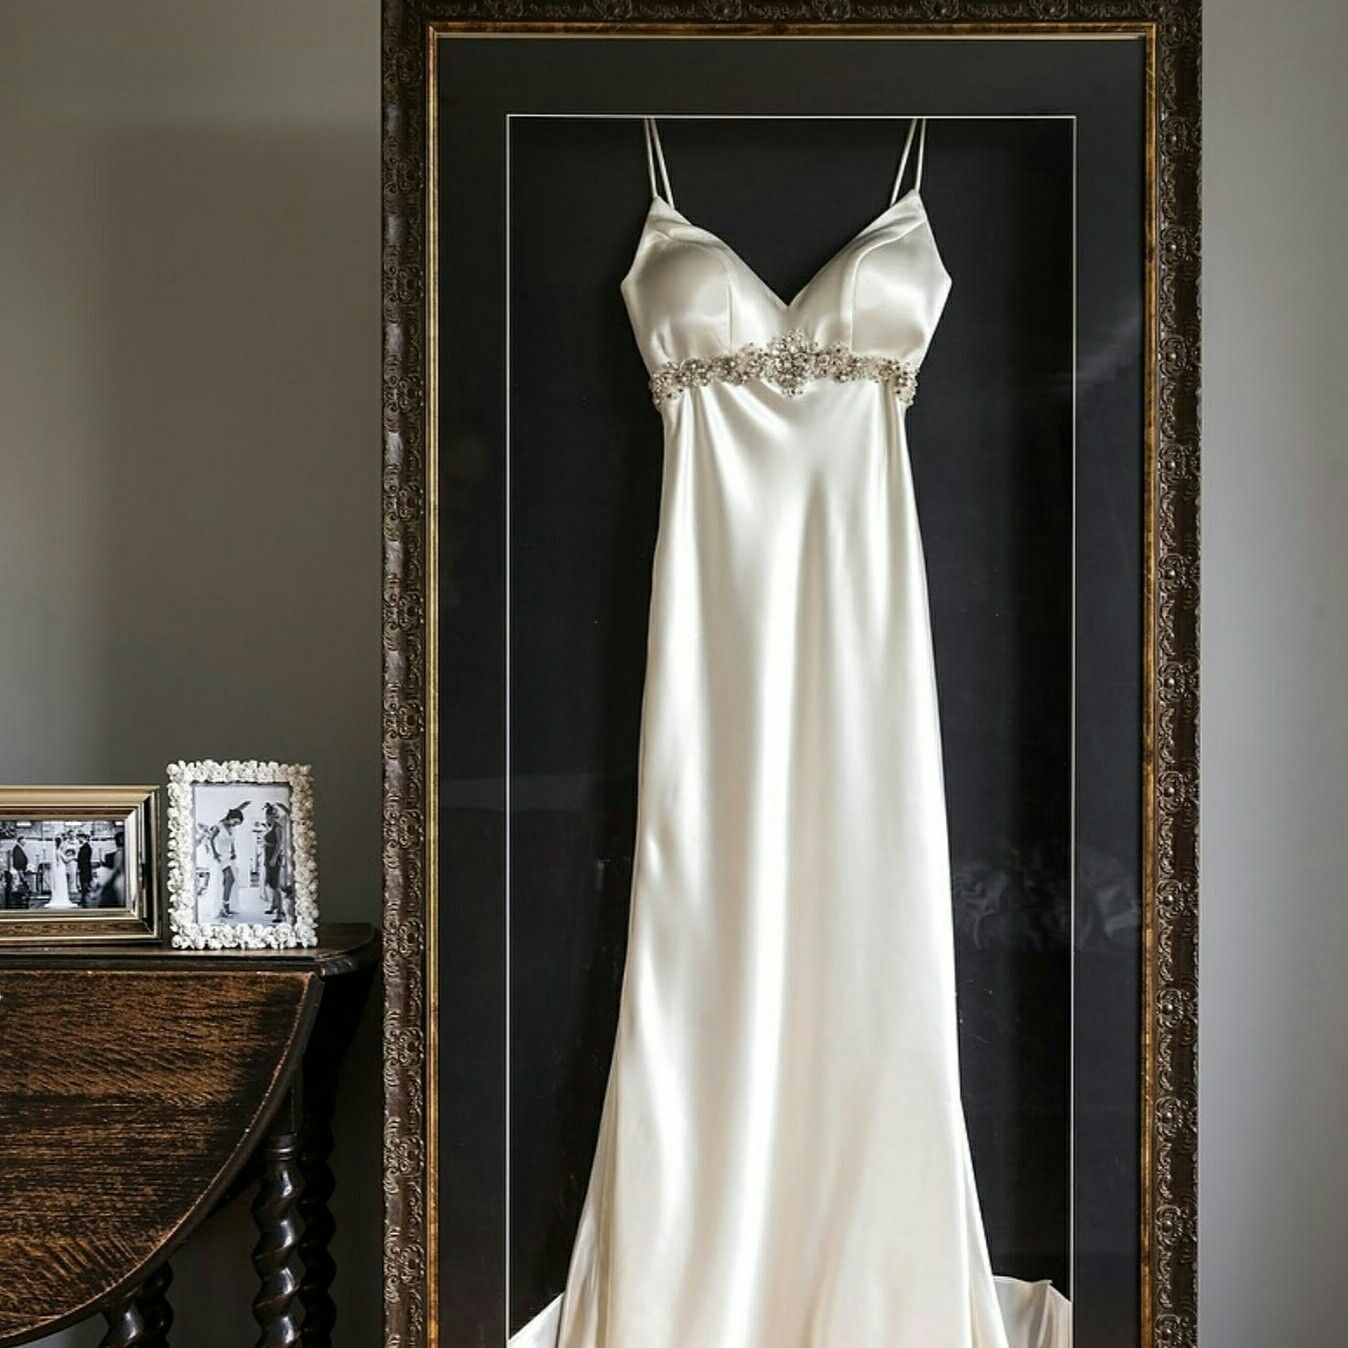 Framed Wedding Dress Beautiful Essense Of Australia Silk Lessismore Dress We Just Love Framing Wedd Wedding Dress Frame Wedding Frames Wedding Dress Storage